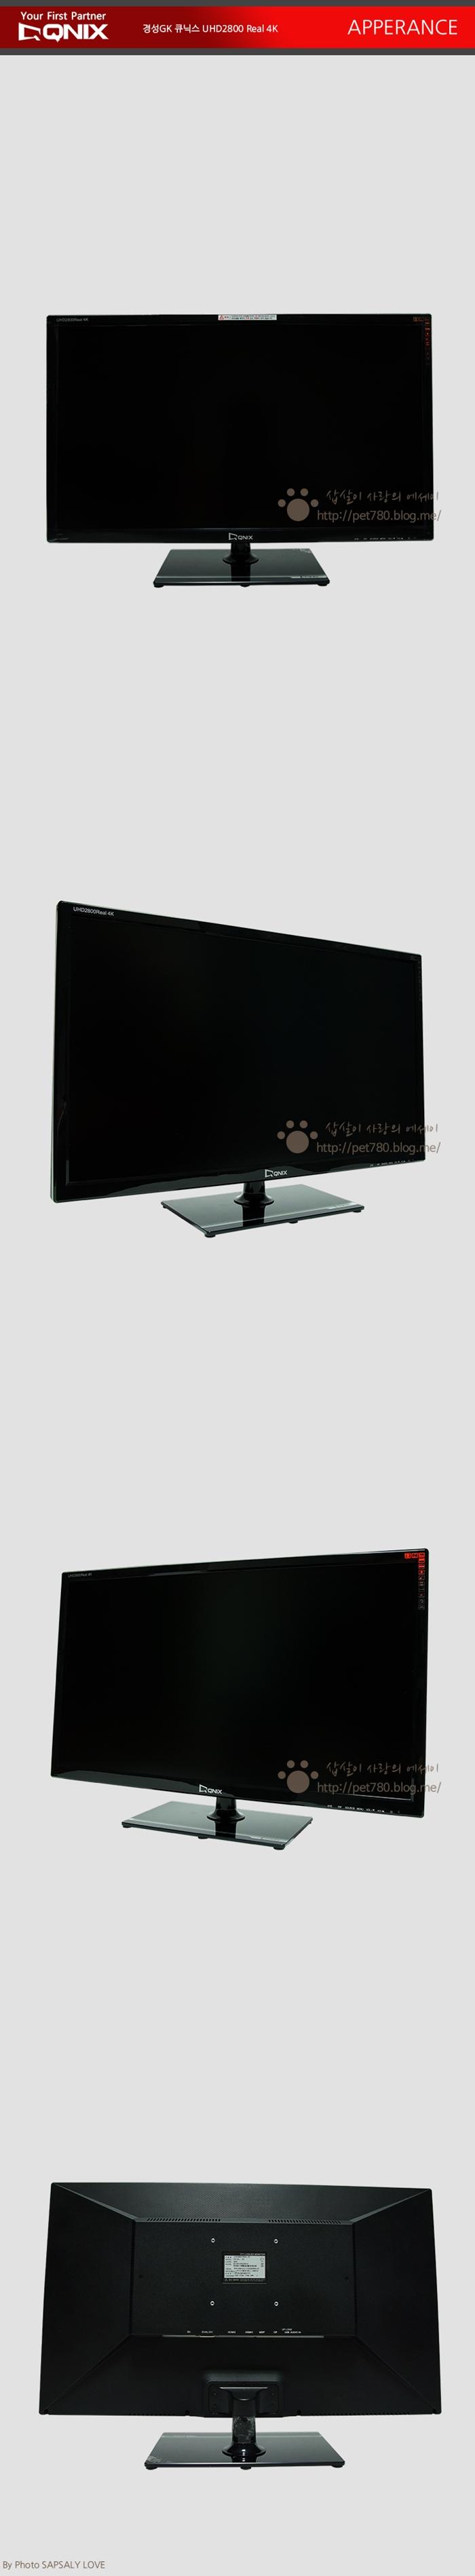 UHD 모니터 외형 경성GK 큐닉스 UHD2800 Real 4K.jpg